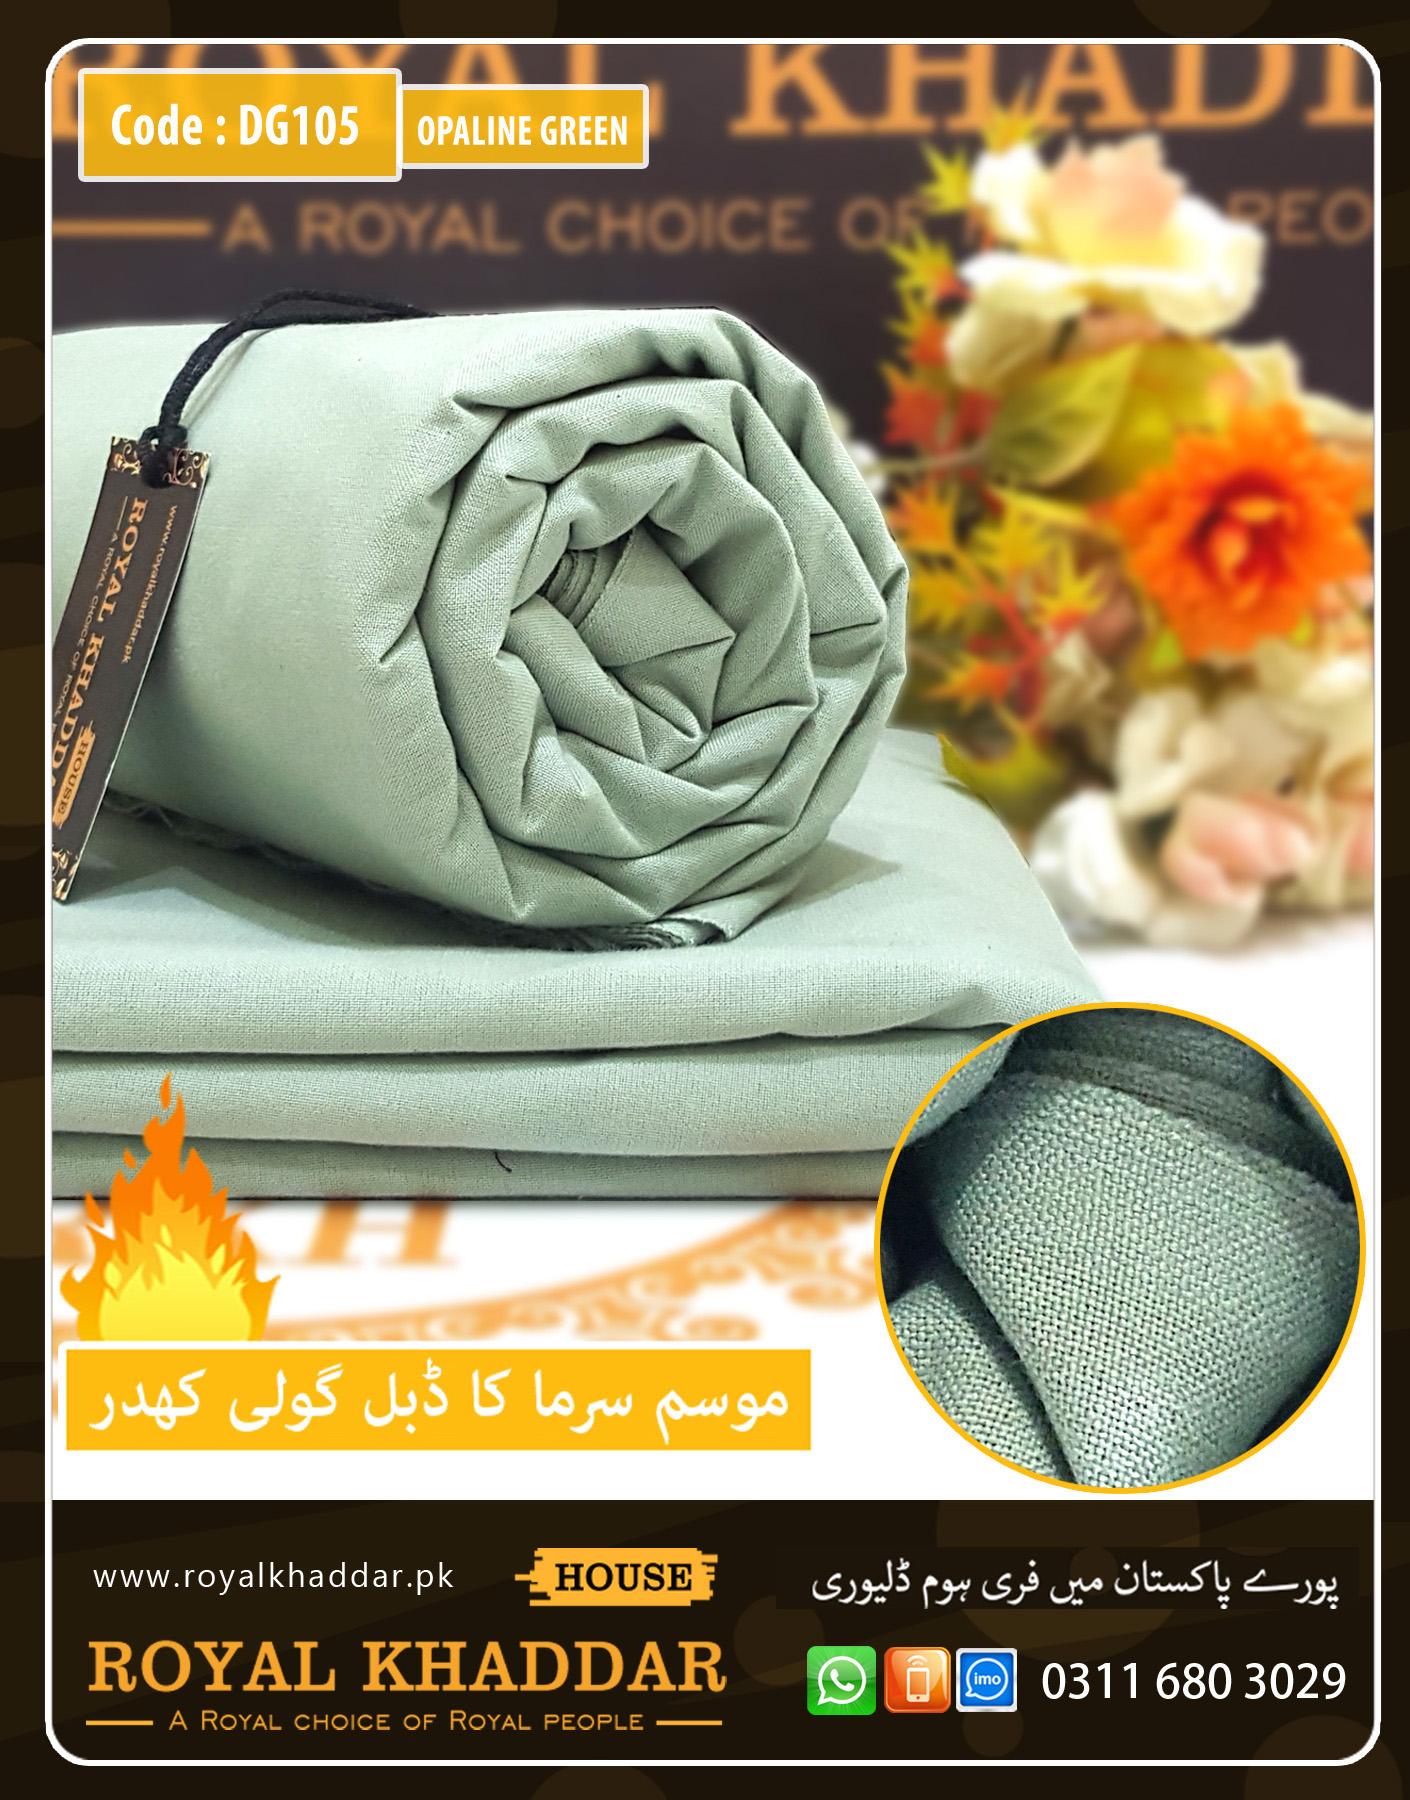 DG105 Opaline Green Goli Winter Khaddar